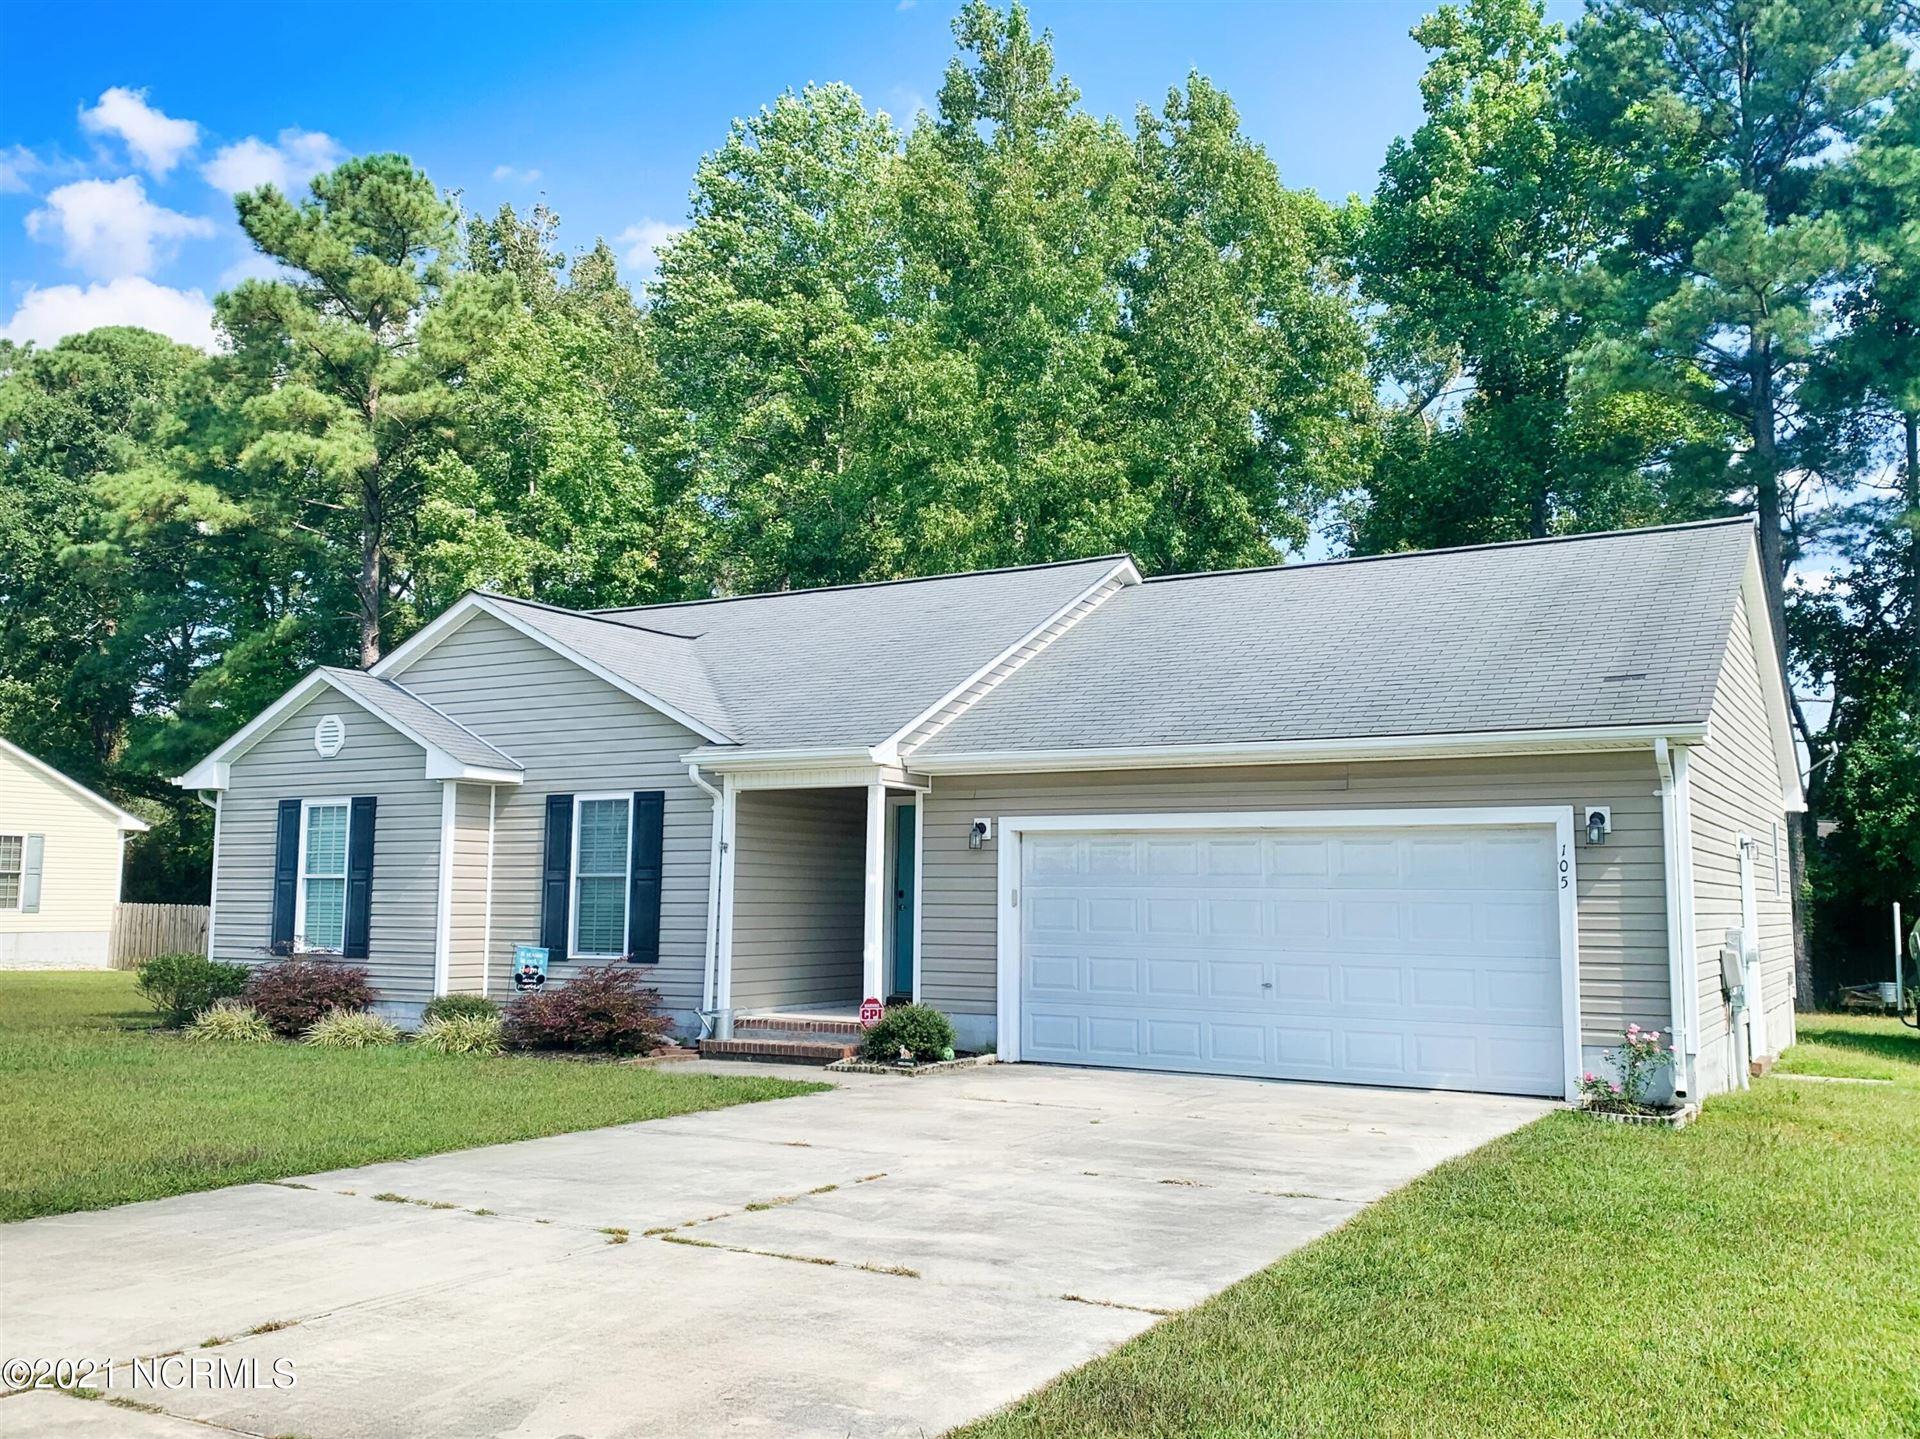 Photo of 105 Laredo Drive, Jacksonville, NC 28540 (MLS # 100292102)